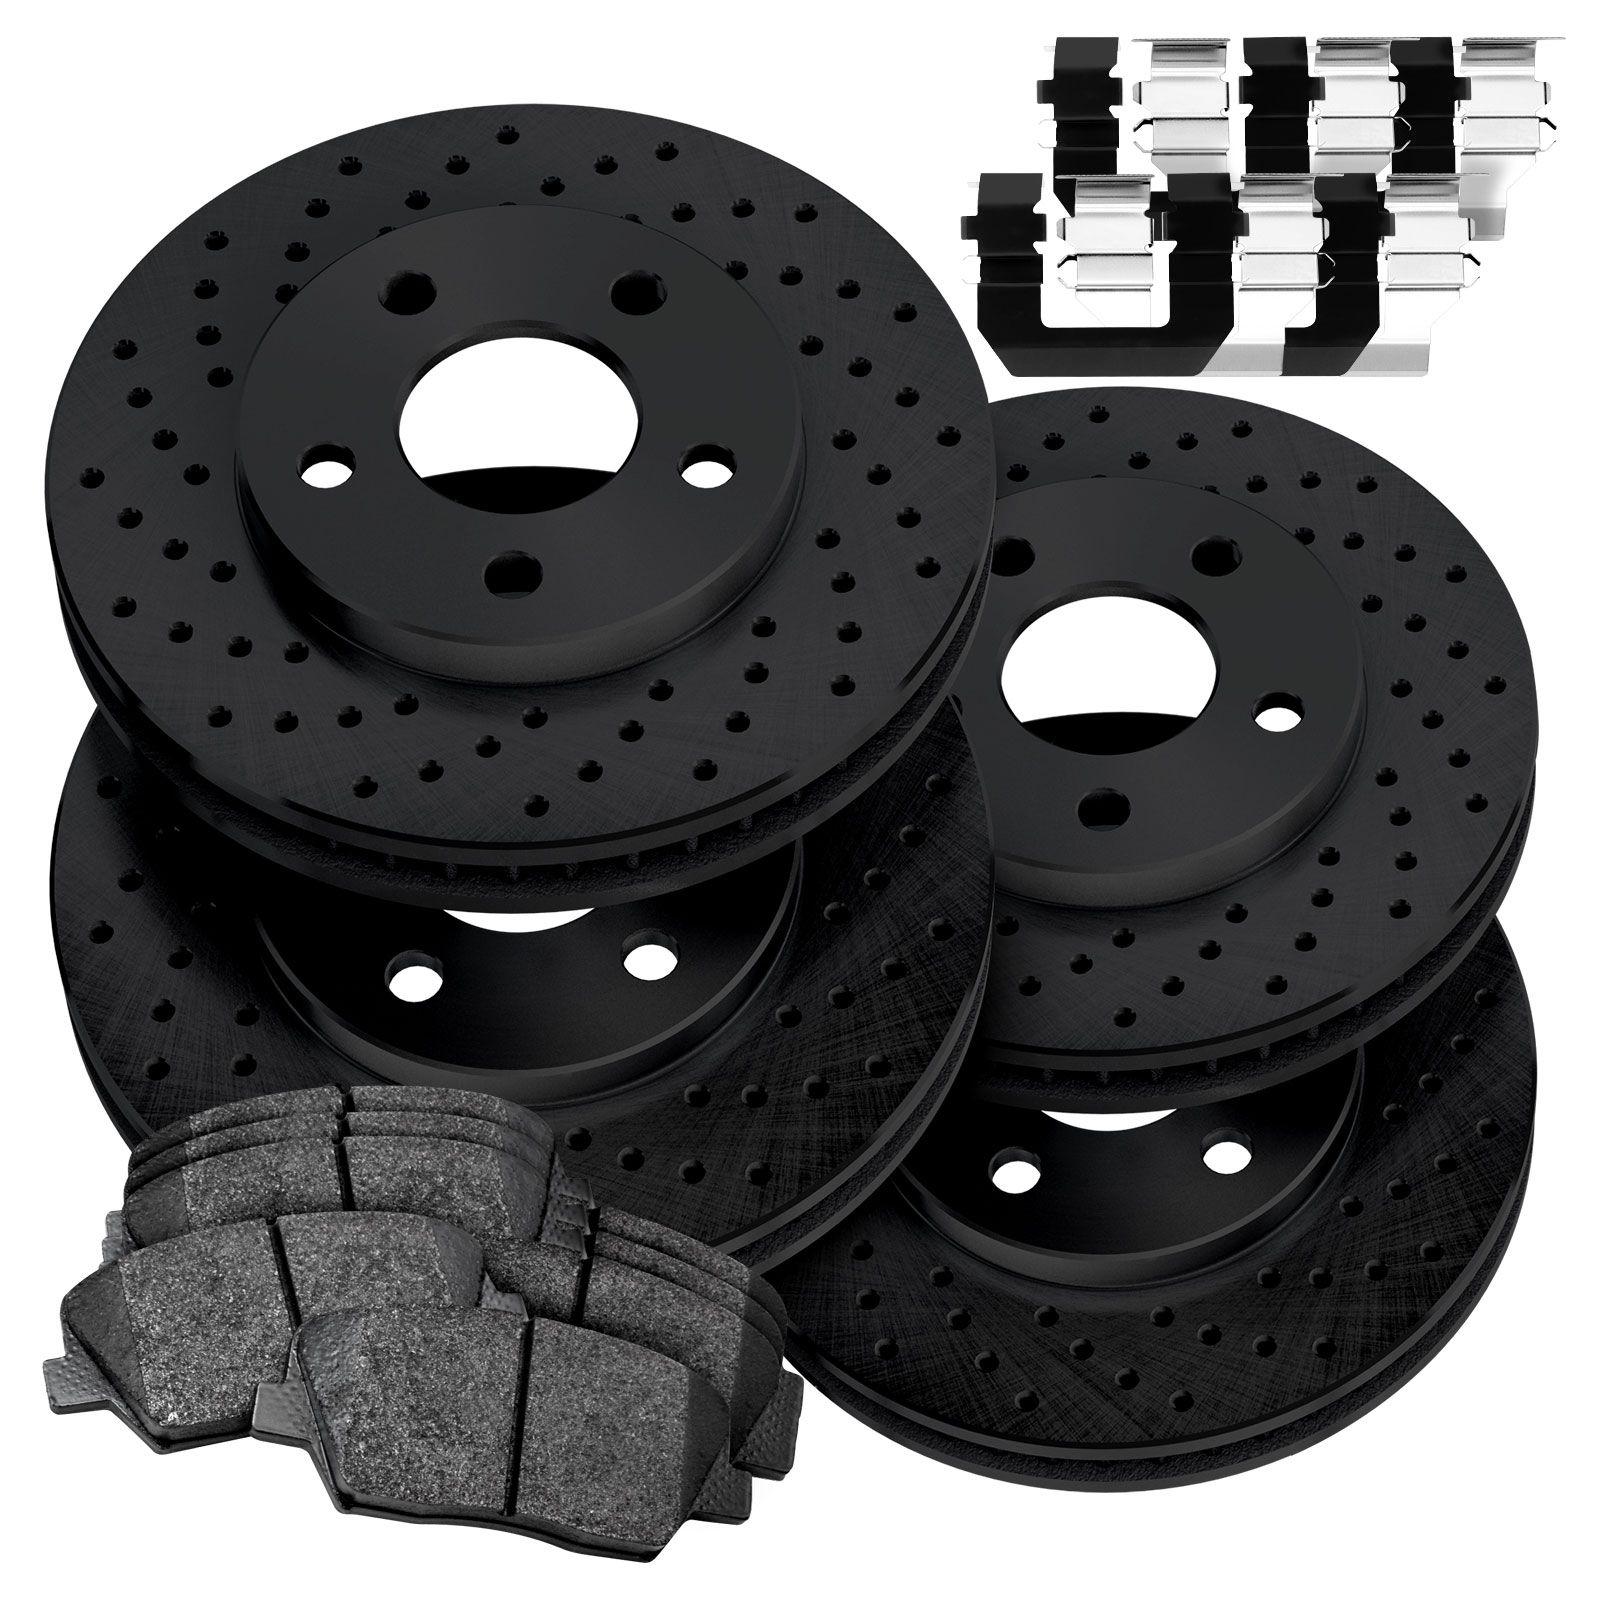 2003 2004 2005 2006 Fits Kia Sorento Rotors Ceramic Pads F+R OE Replacement